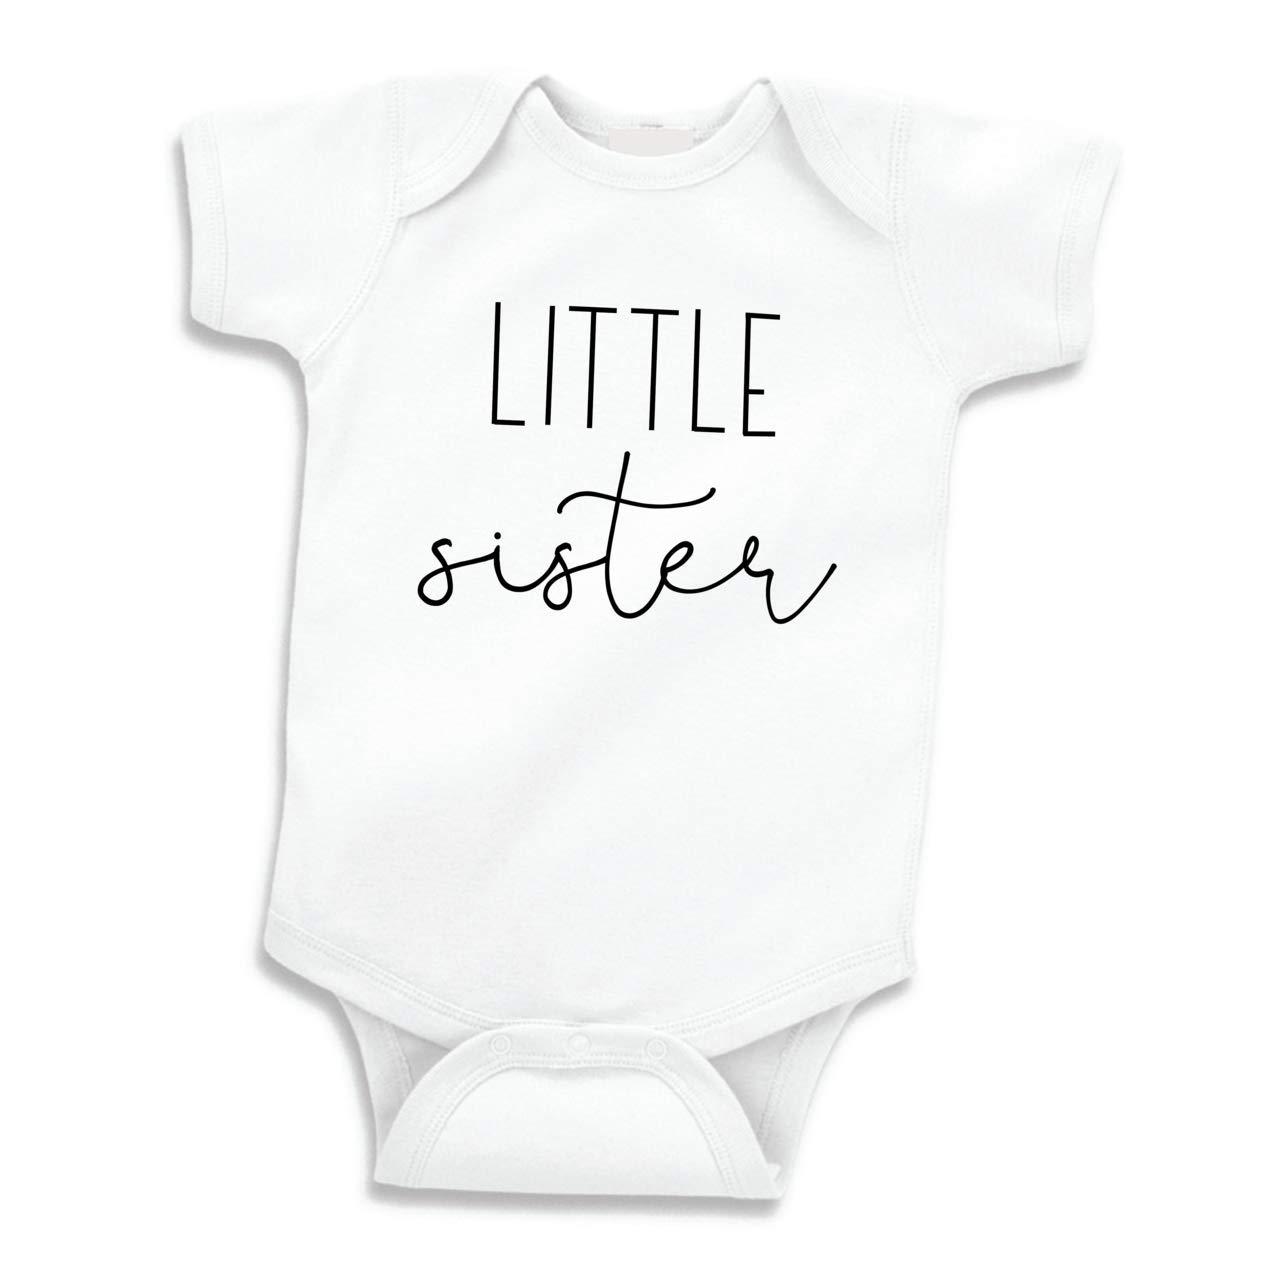 Little Sister Shirt for Girls Baby Announcement